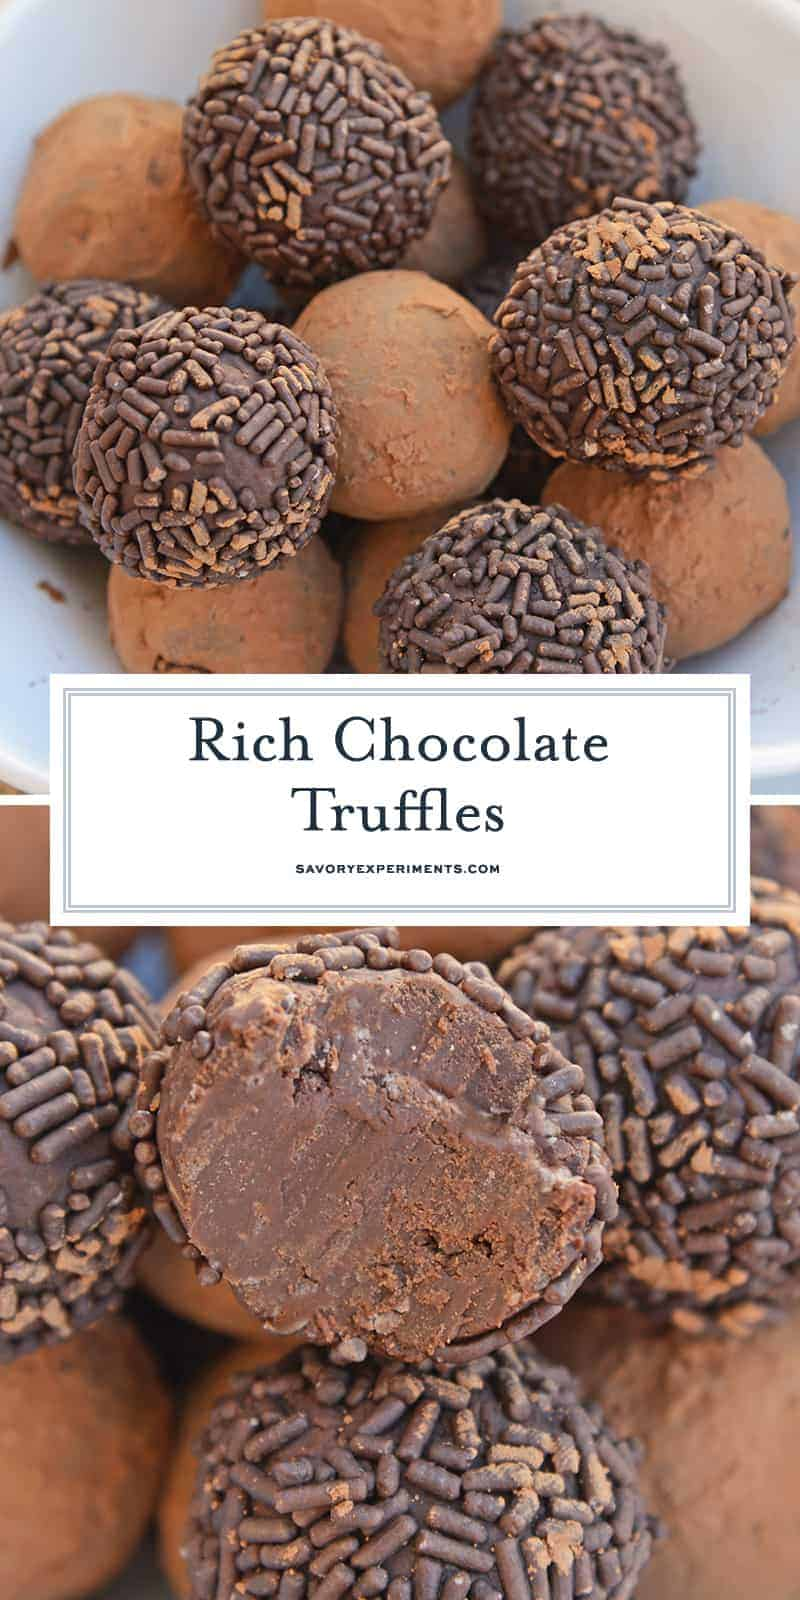 Easy Chocolate Truffles Truffles Using Condensed Milk Easy Chocolate Truffles Only Use 4 In 2020 Chocolate Truffles Easy Truffle Recipe Chocolate Truffle Recipe Easy